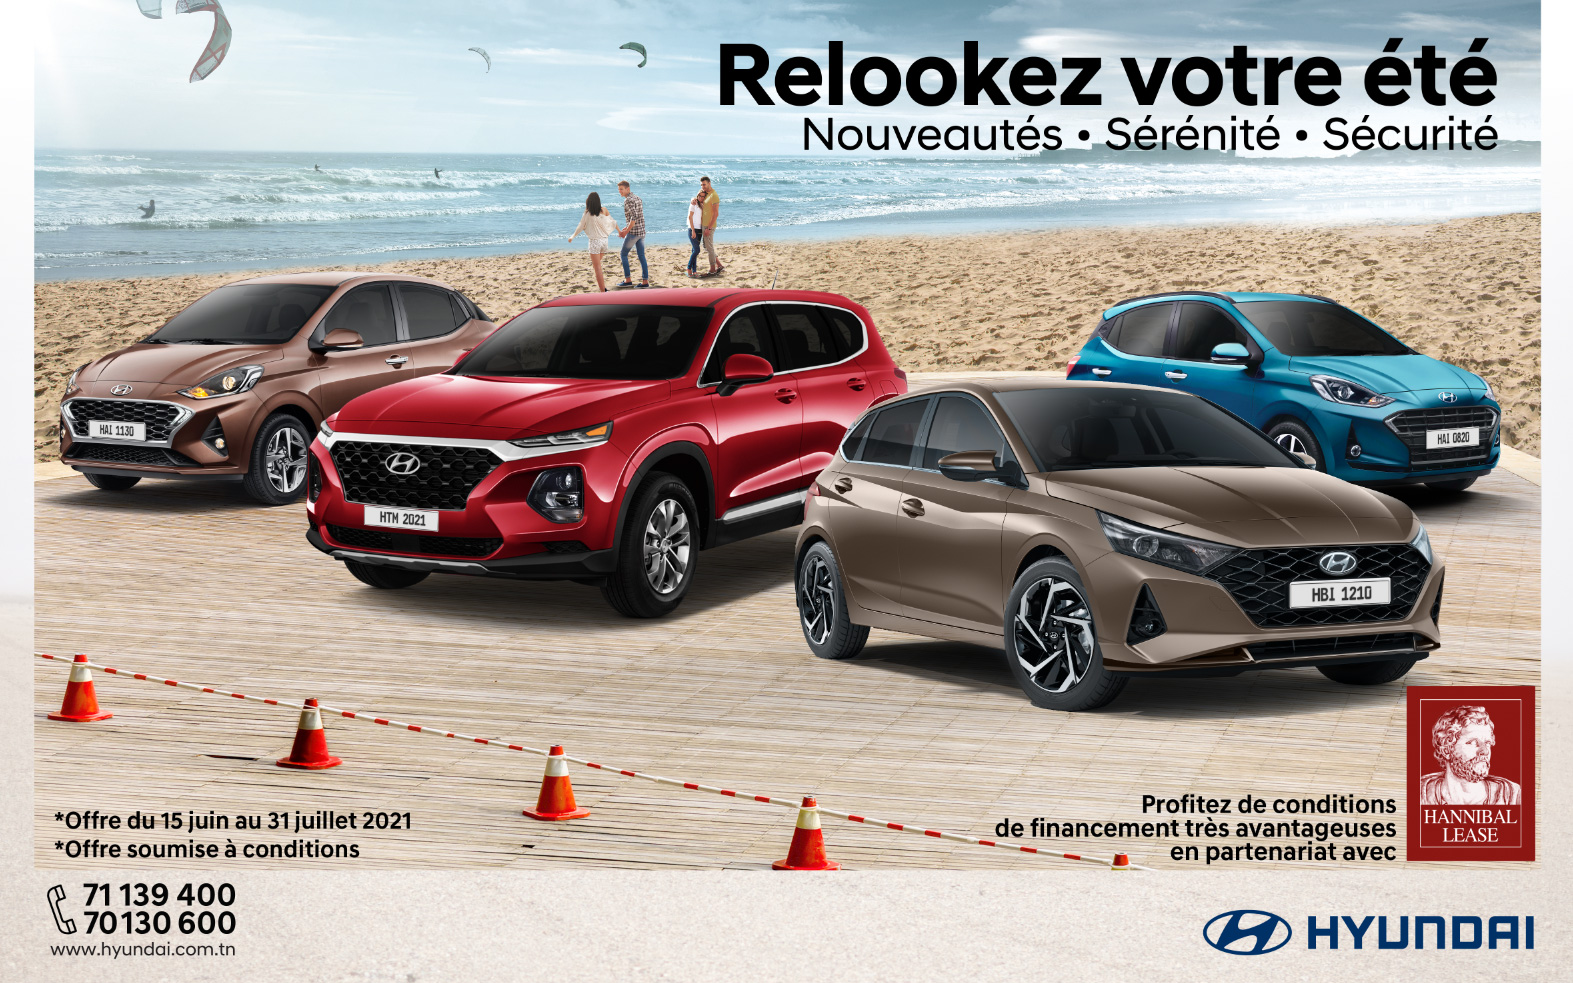 Hyundai Tunisie et Hannibal Lease